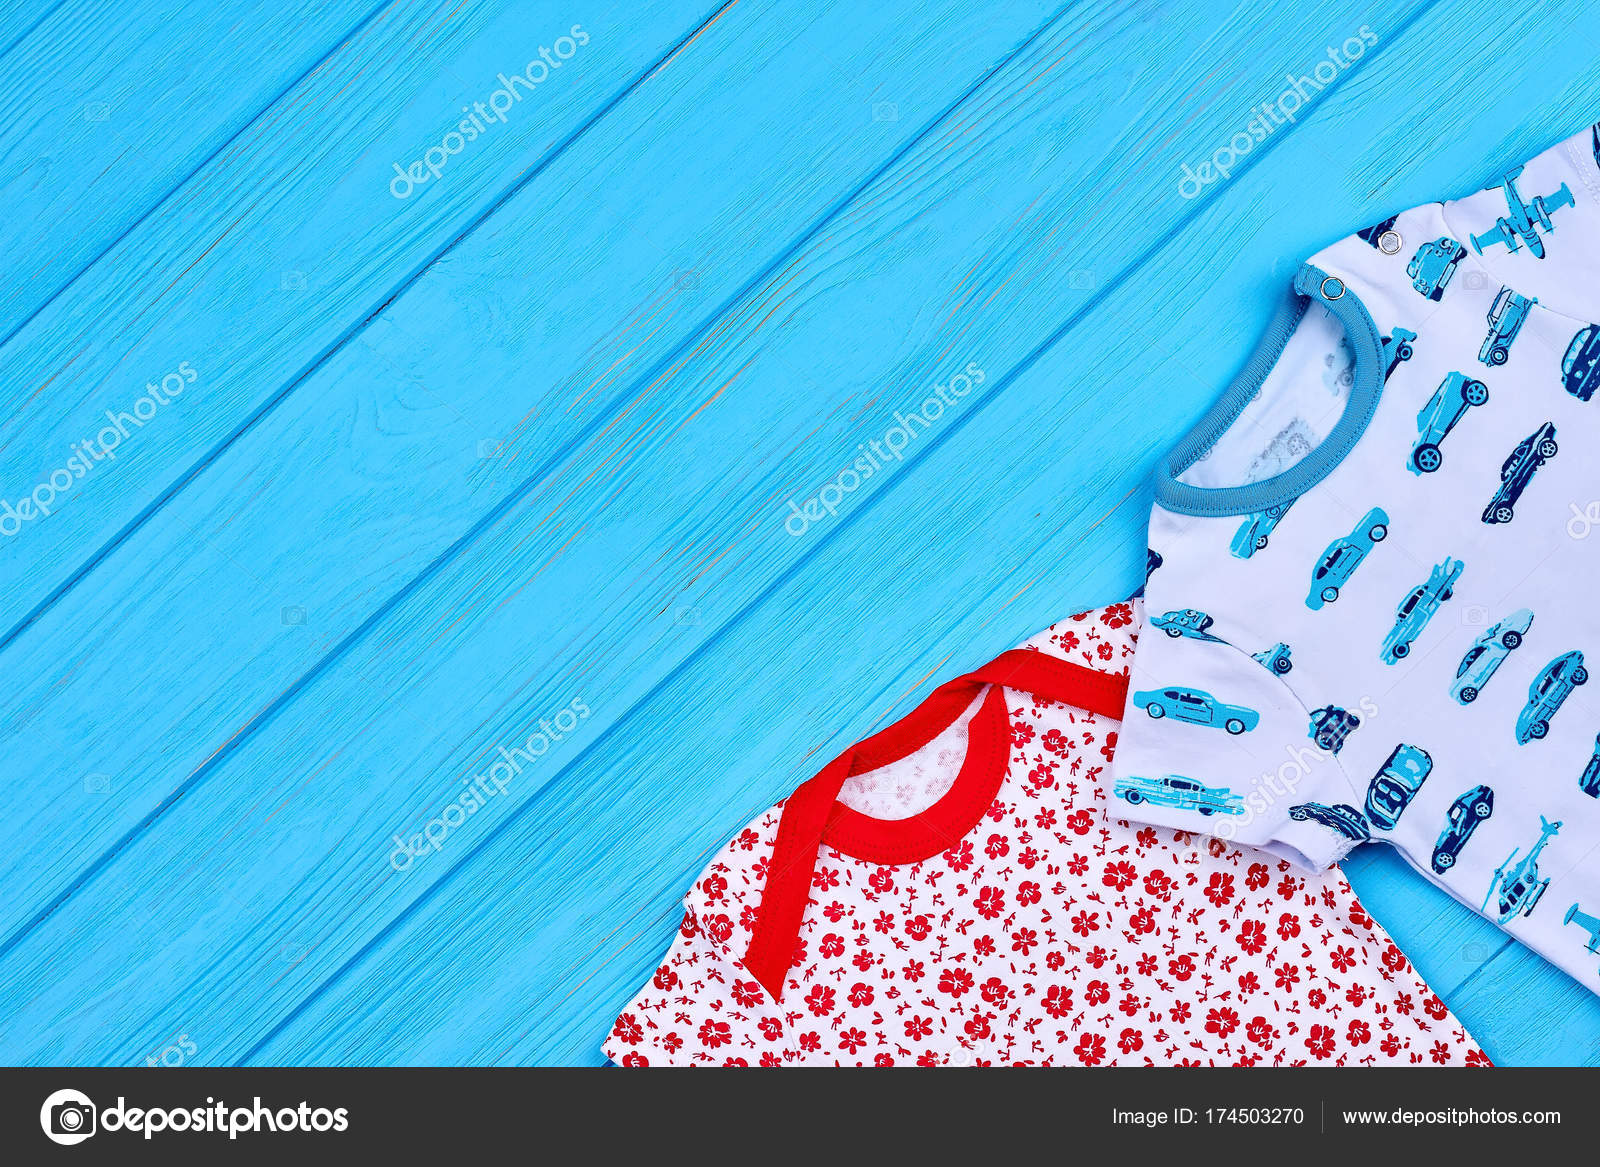 a7414d29757 Τα παιδιά καλοκαιρινά ρούχα, αντίγραφο χώρου. Νηπίων μωρών βαμβακιού ένδυμα  σε μπλε φόντο ξύλινη, κάτοψη — Εικόνα από ...